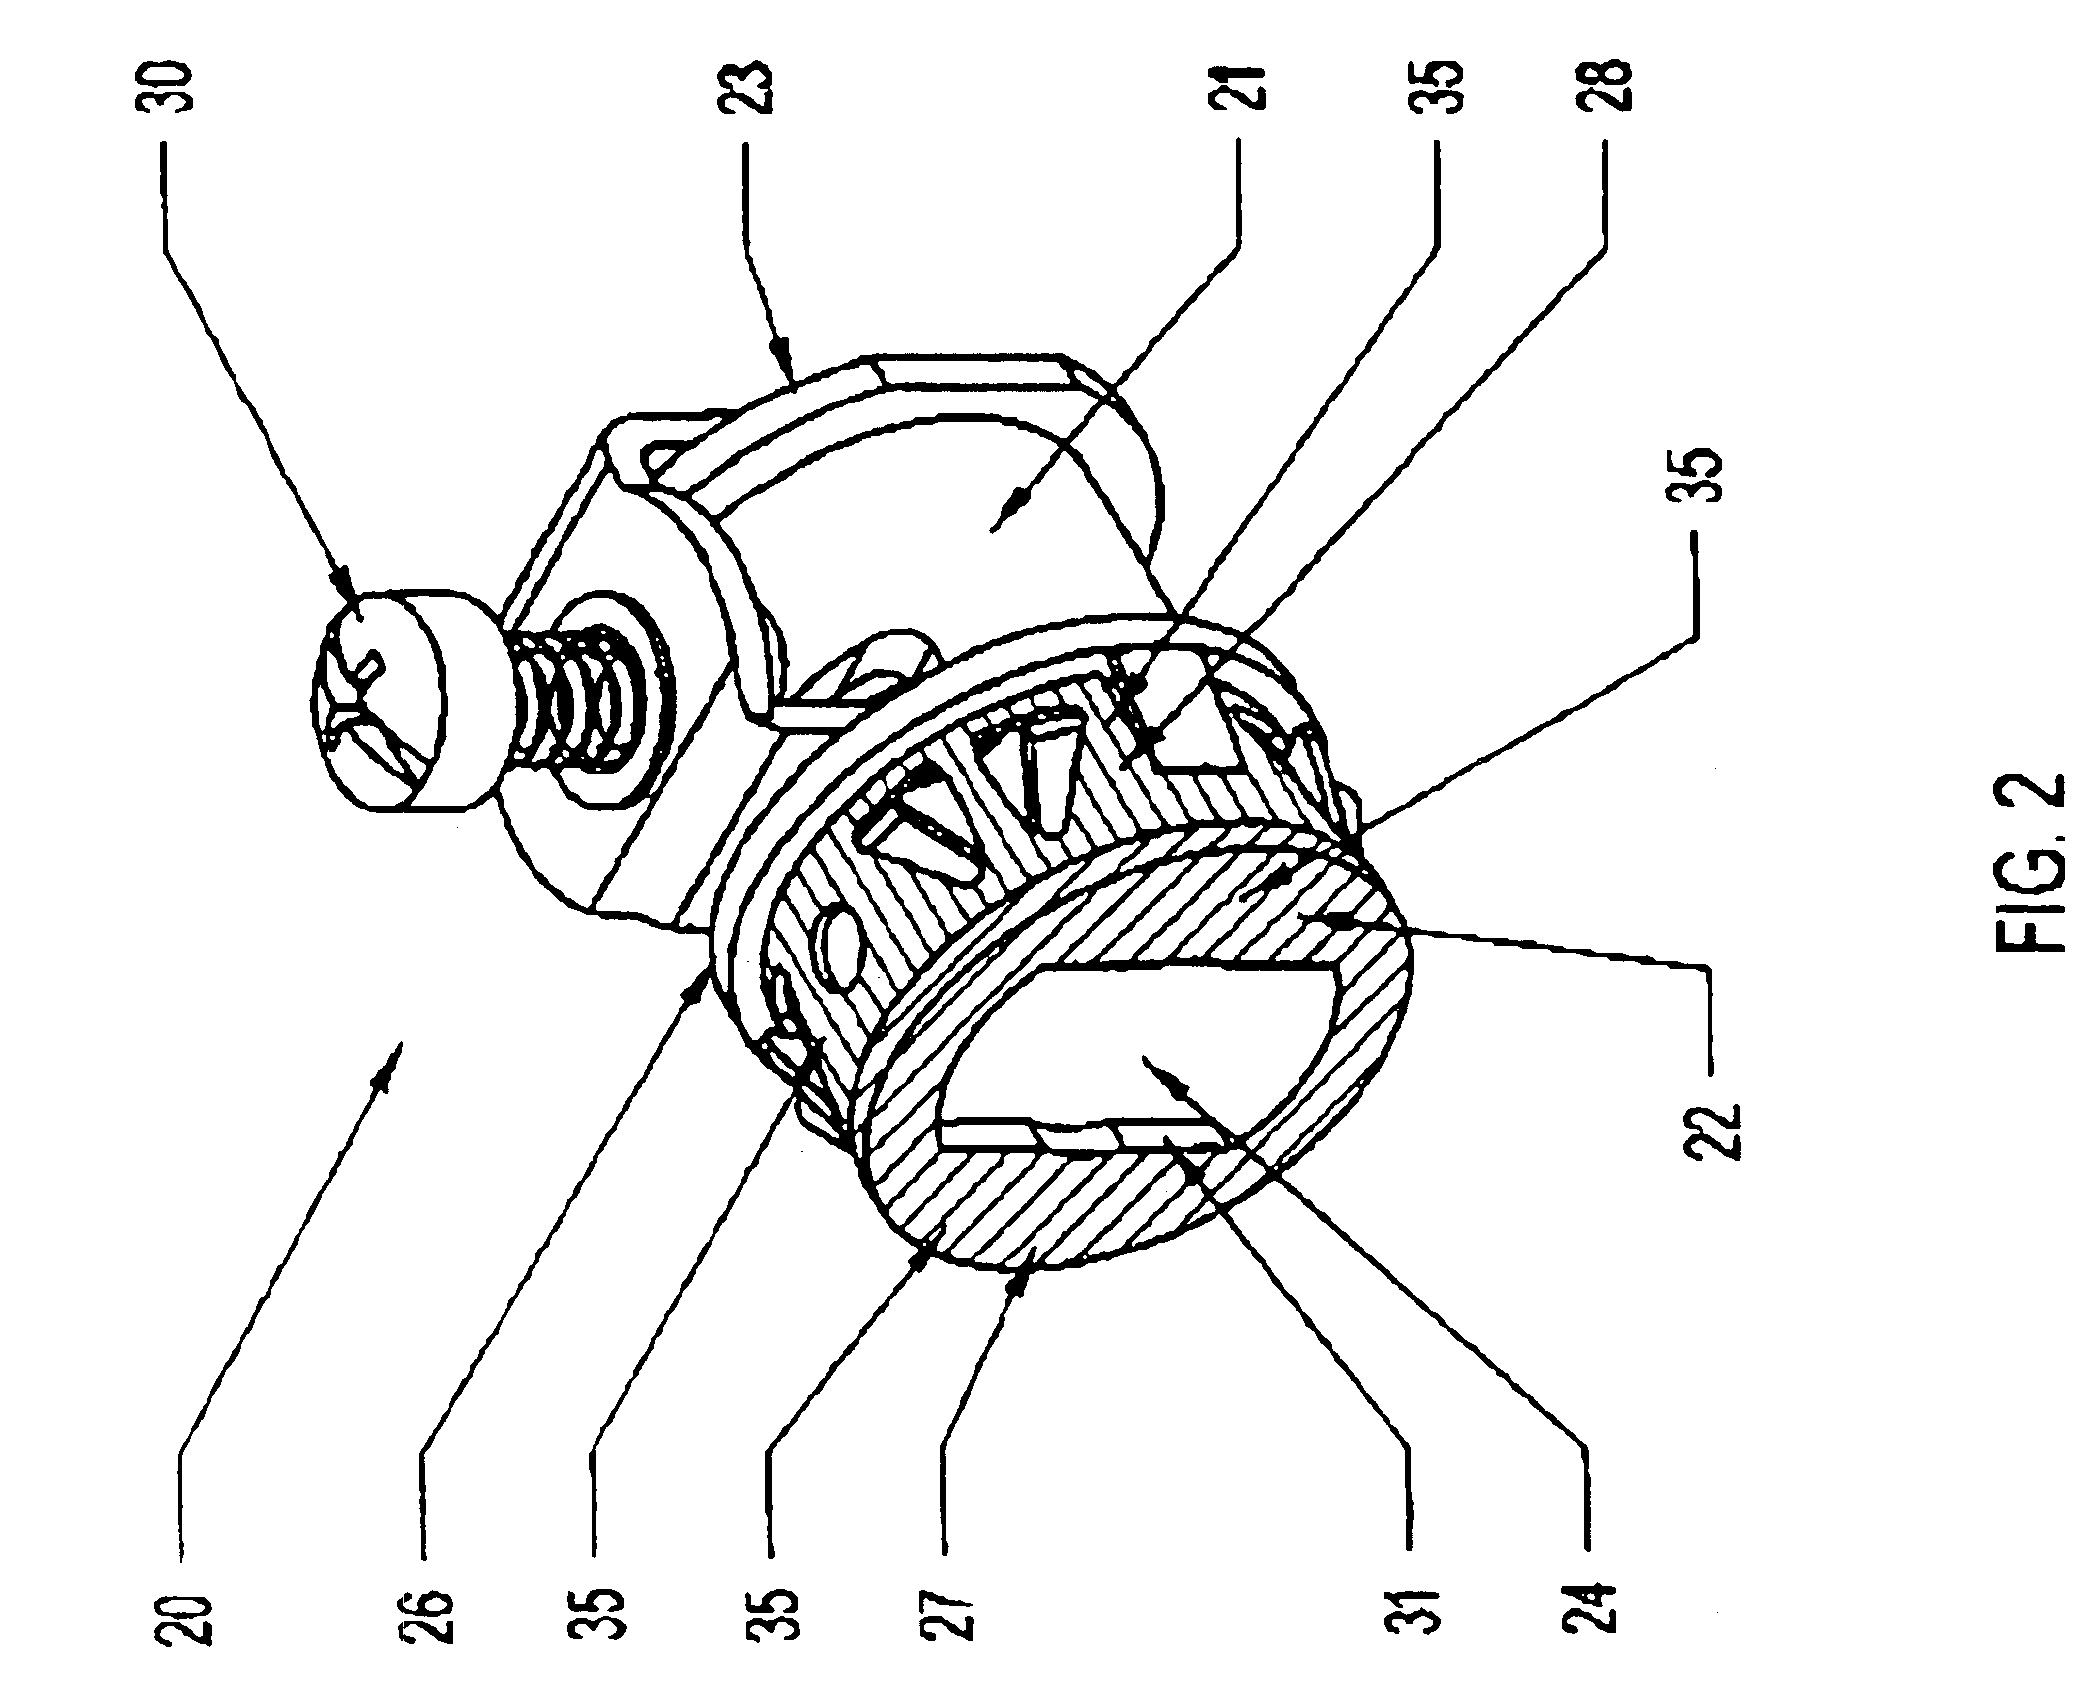 US06861585 20050301 D00002 three phase plug wiring diagram,phase wiring diagram images database,20 Amp Plug For 120vac Wiring Diagram